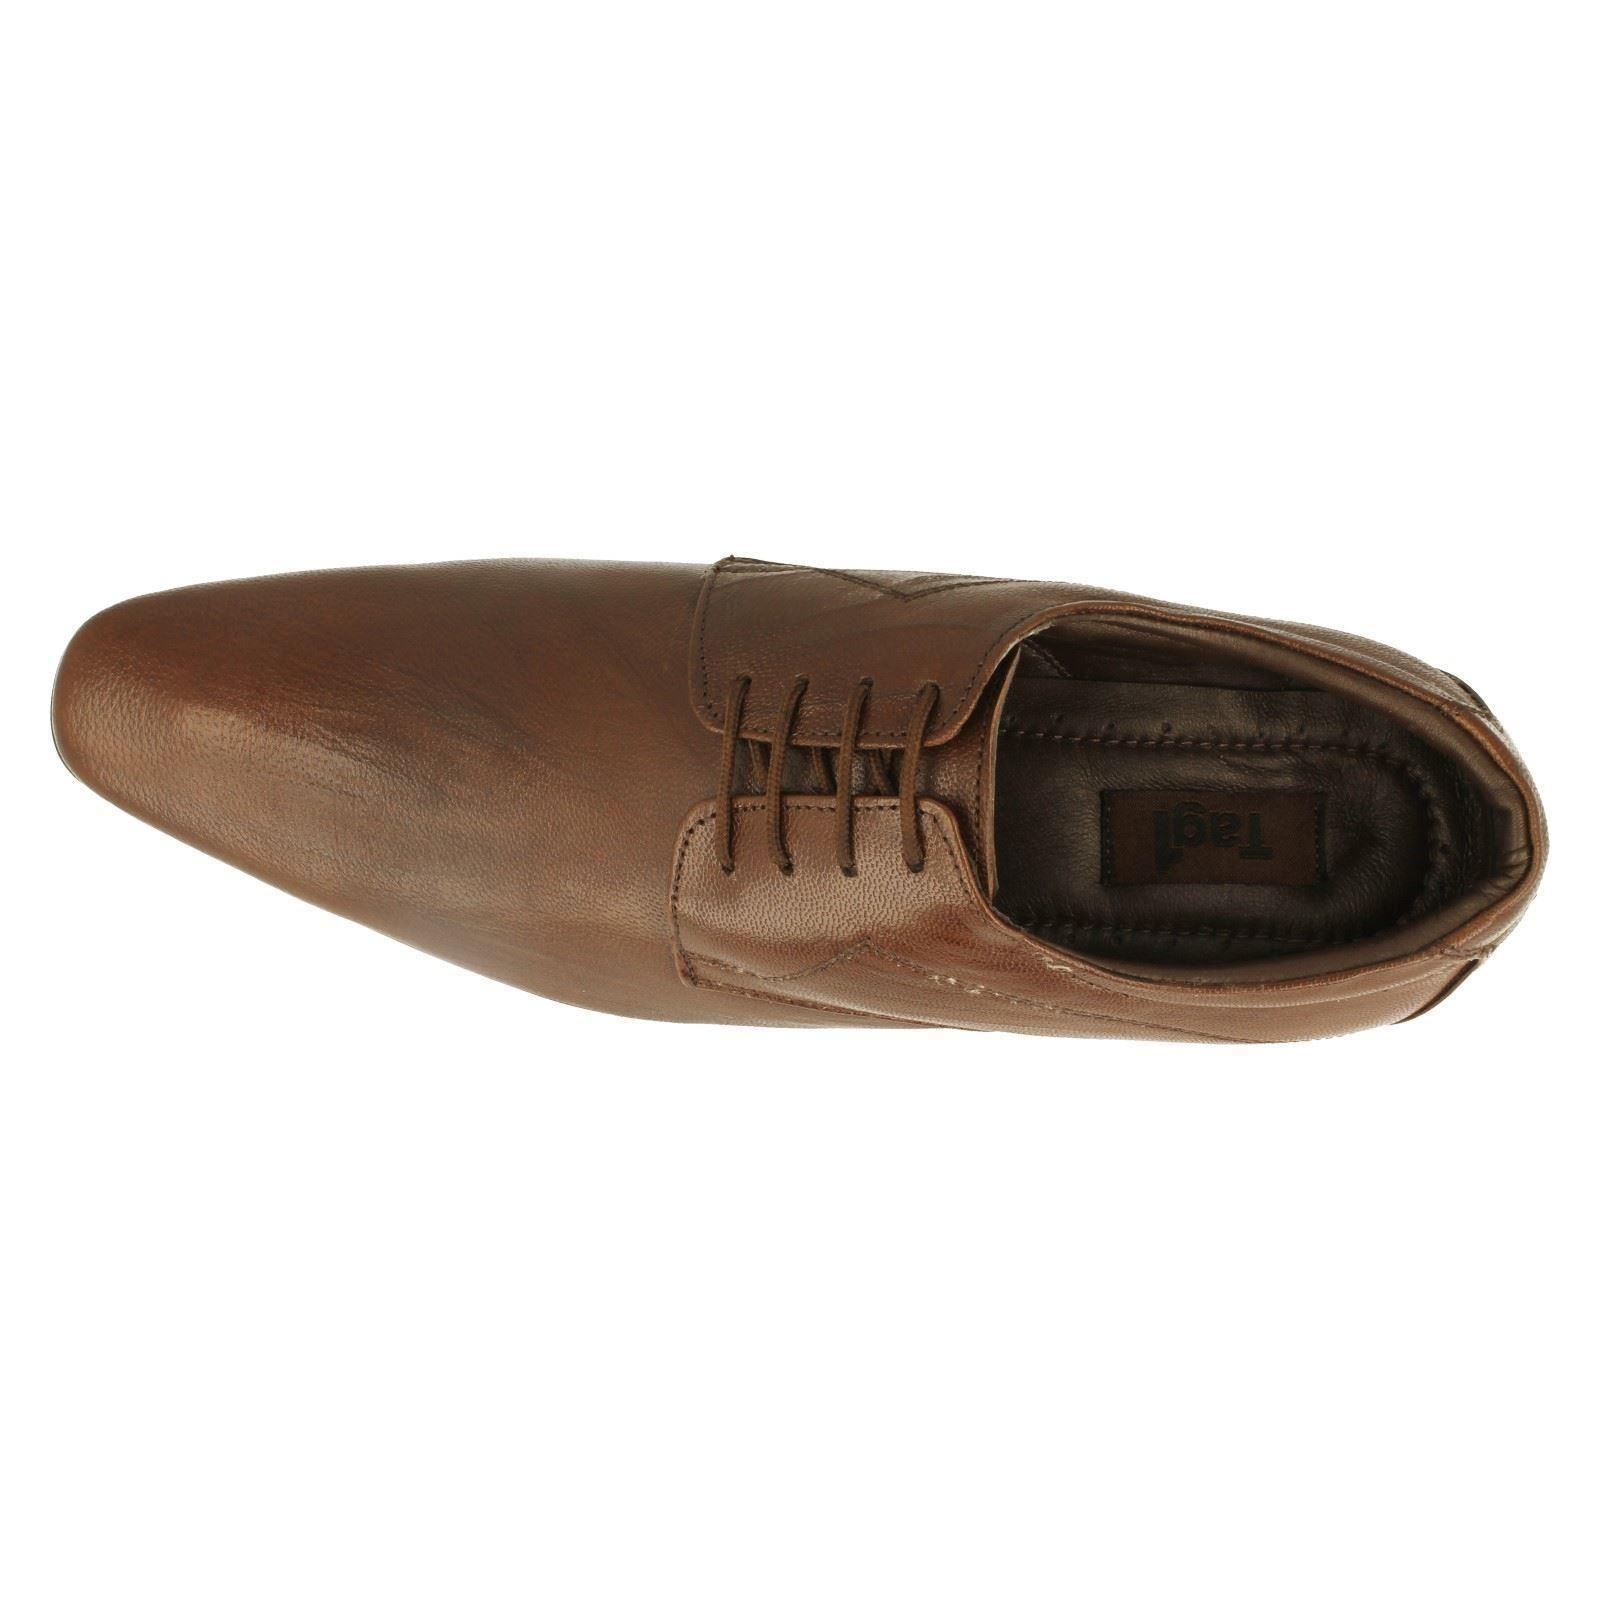 Uomo Tag1 AM-814 Smart Schuhes The Style AM-814 Tag1 -W da28f8